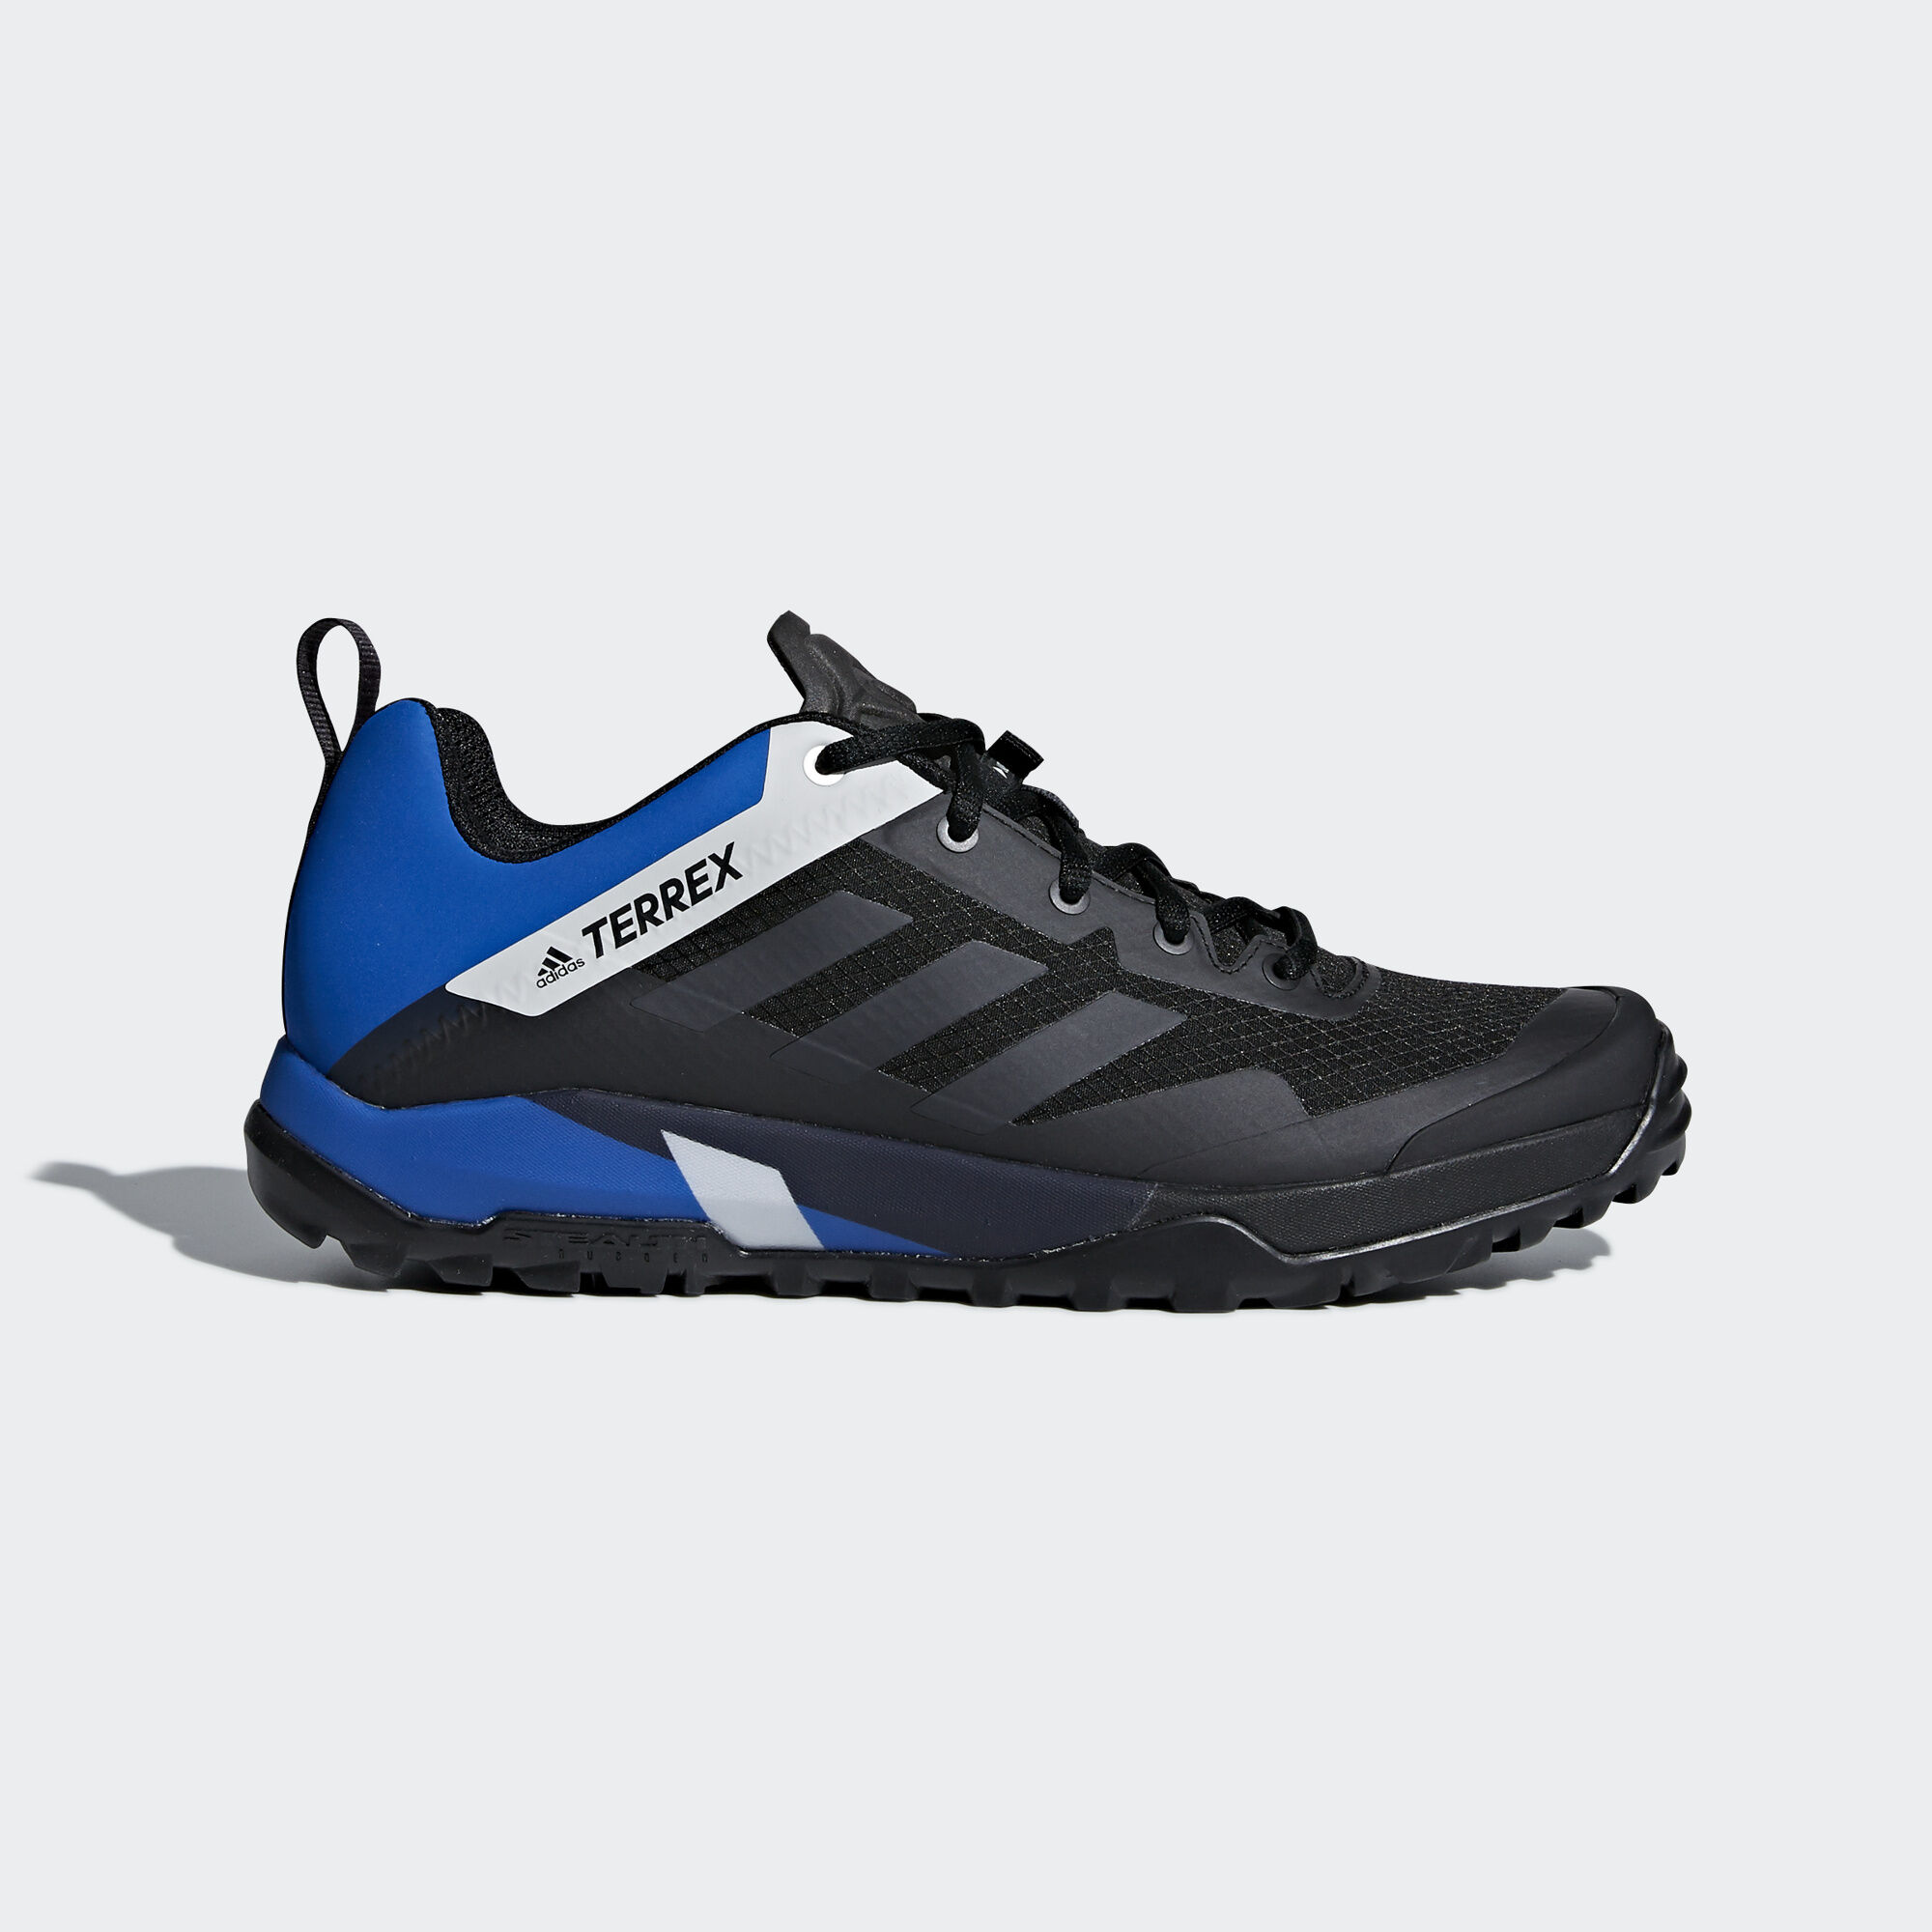 adidas - Terrex Trail Cross SL Shoes Core Black Carbon Blue Beauty CM7562 34b4771aa